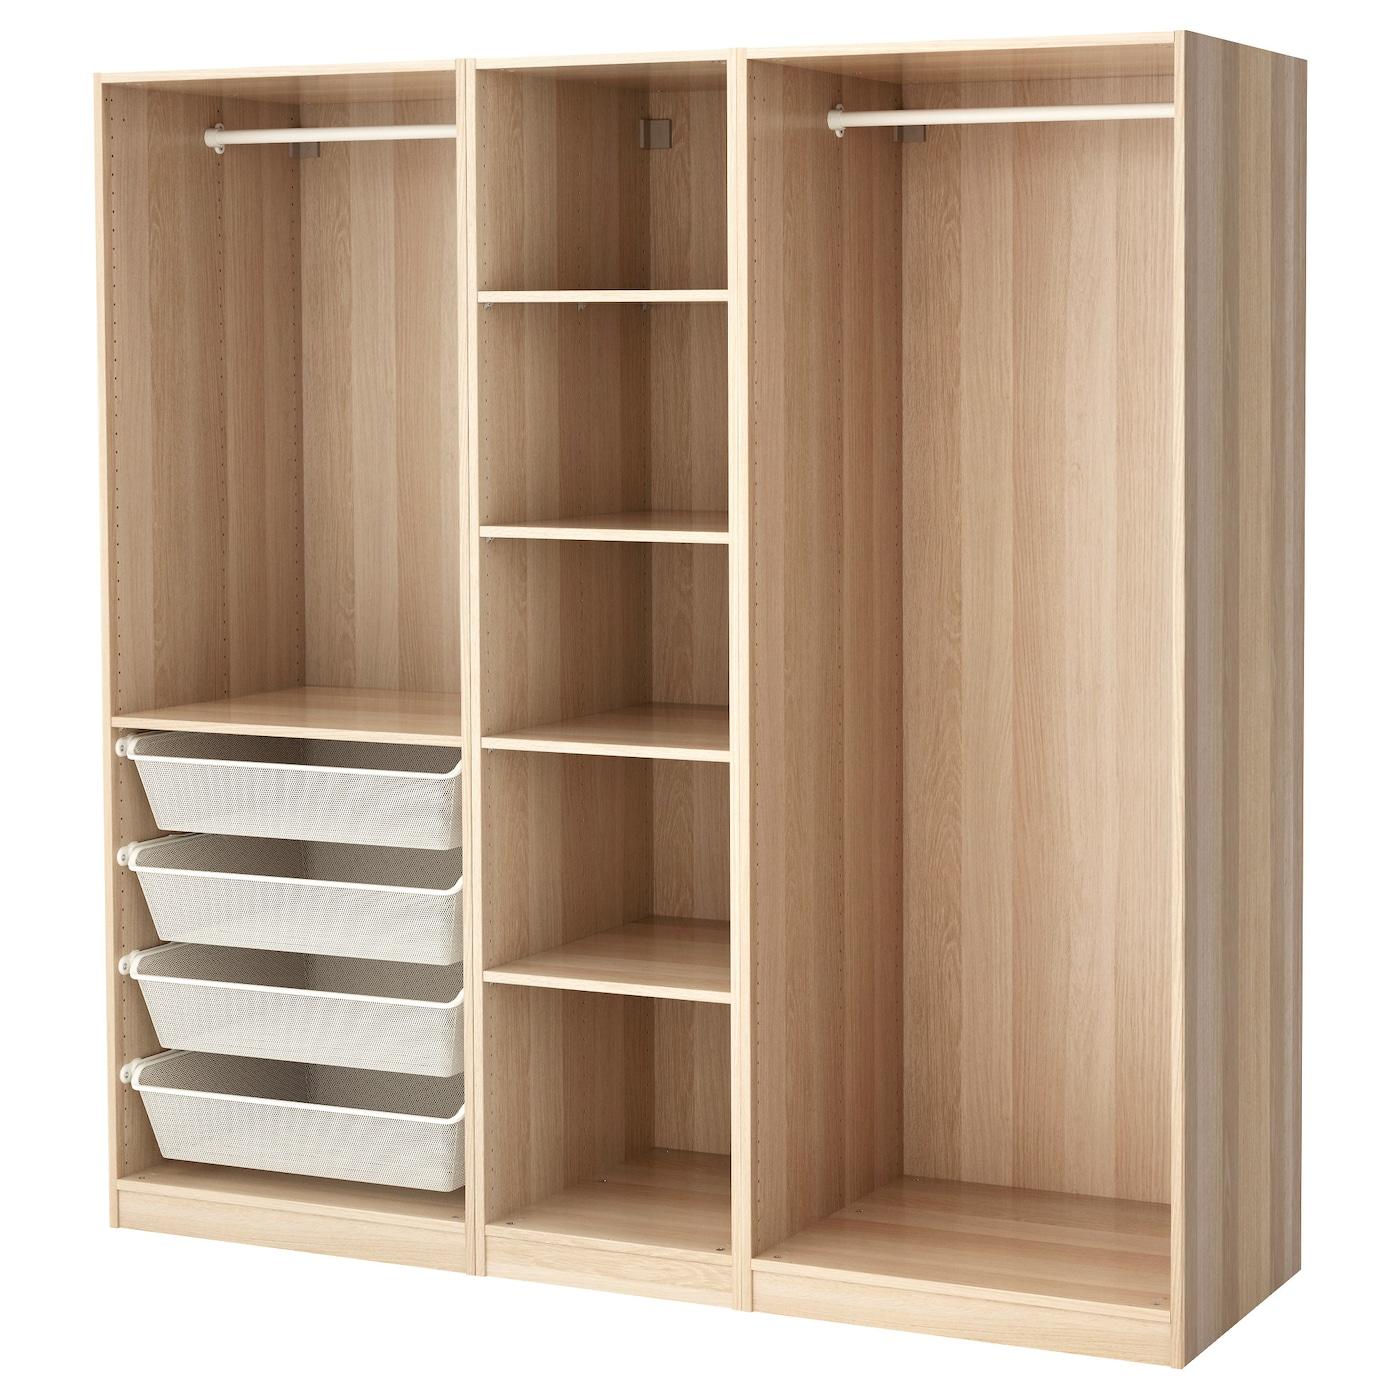 pax wardrobe white stained oak effect 200 x 58 x 201 cm ikea. Black Bedroom Furniture Sets. Home Design Ideas